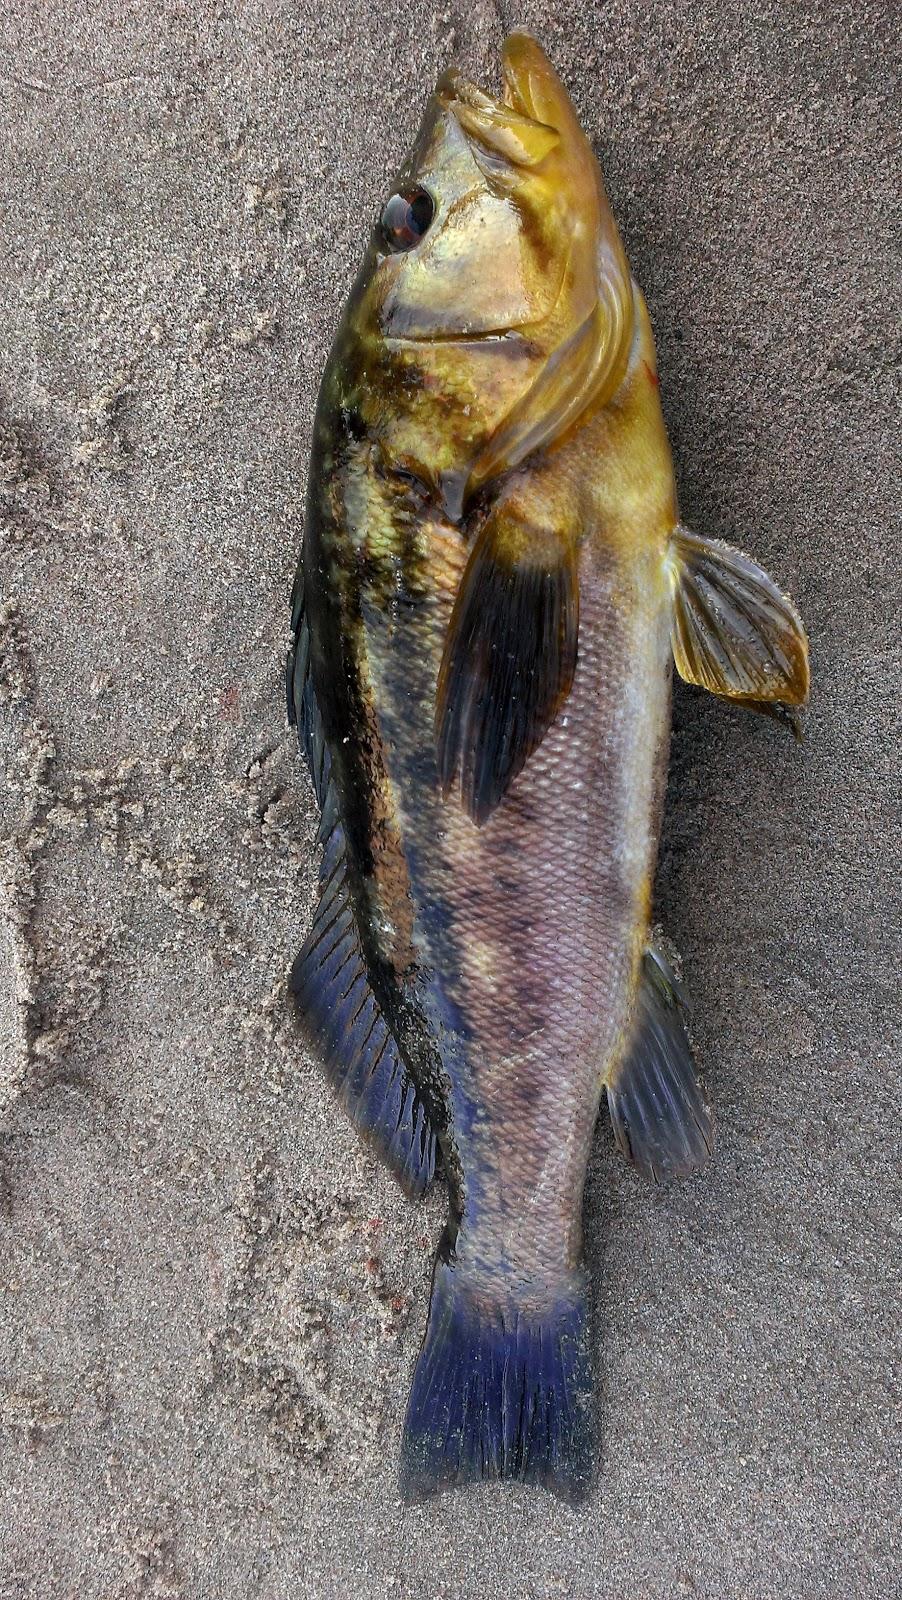 Burger 39 s fishing log surf fishing malibu 10 18 2013 with for Calico bass fishing